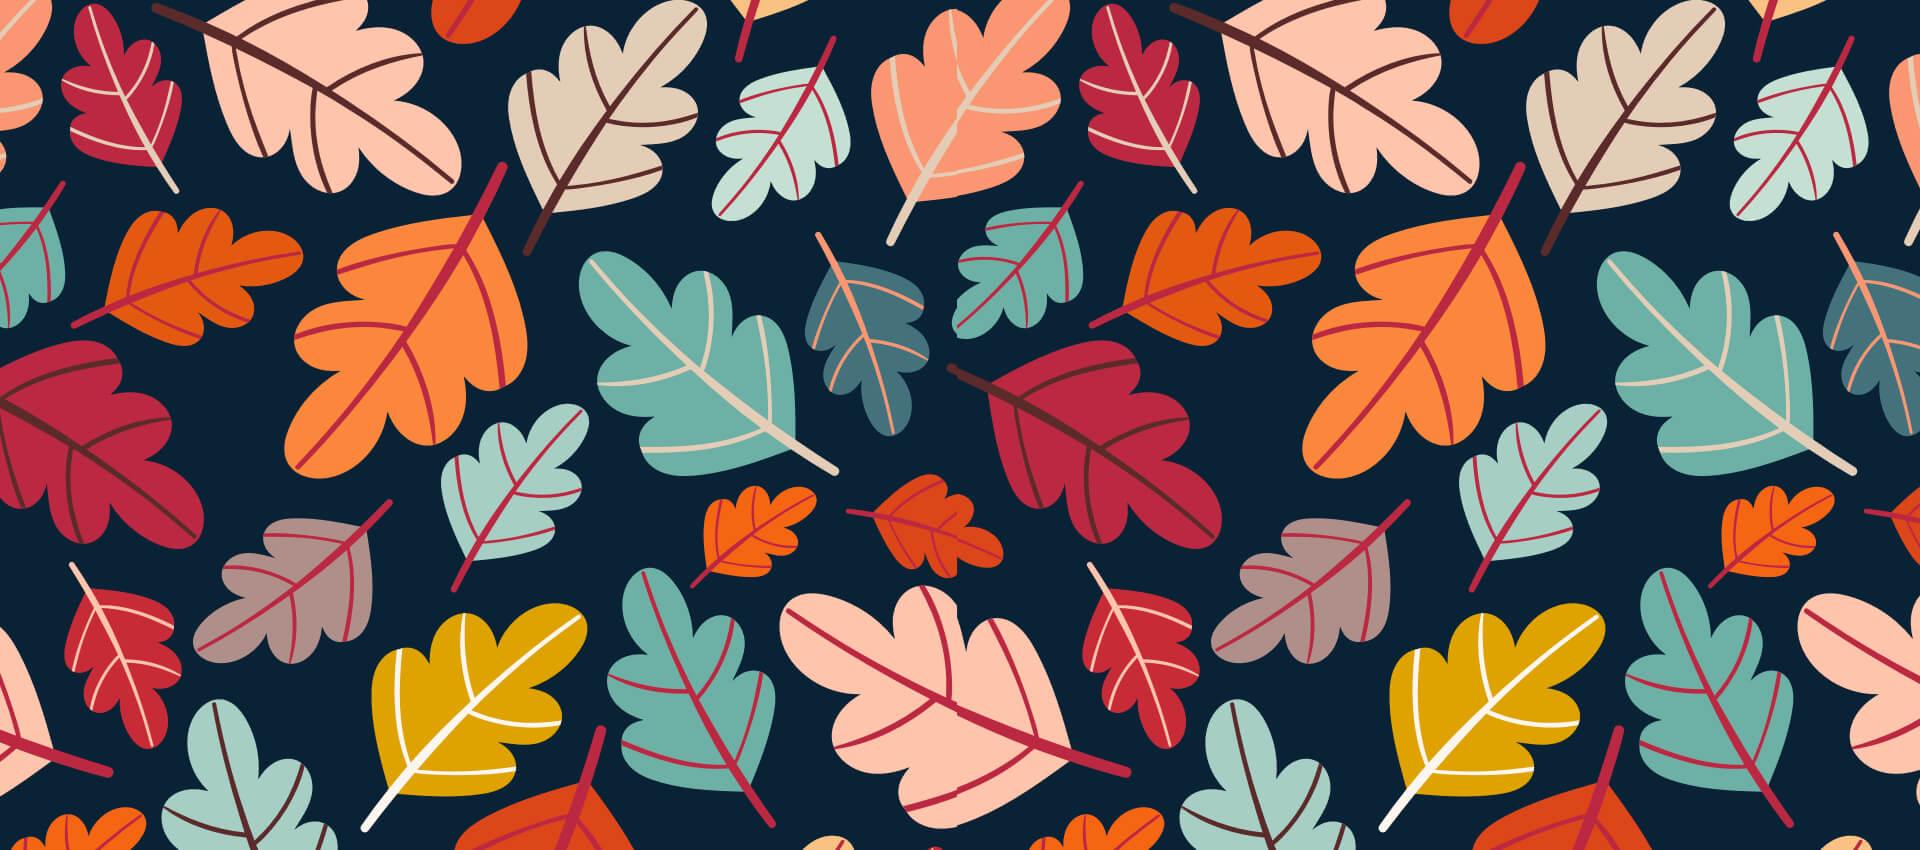 illustration of fall leafs